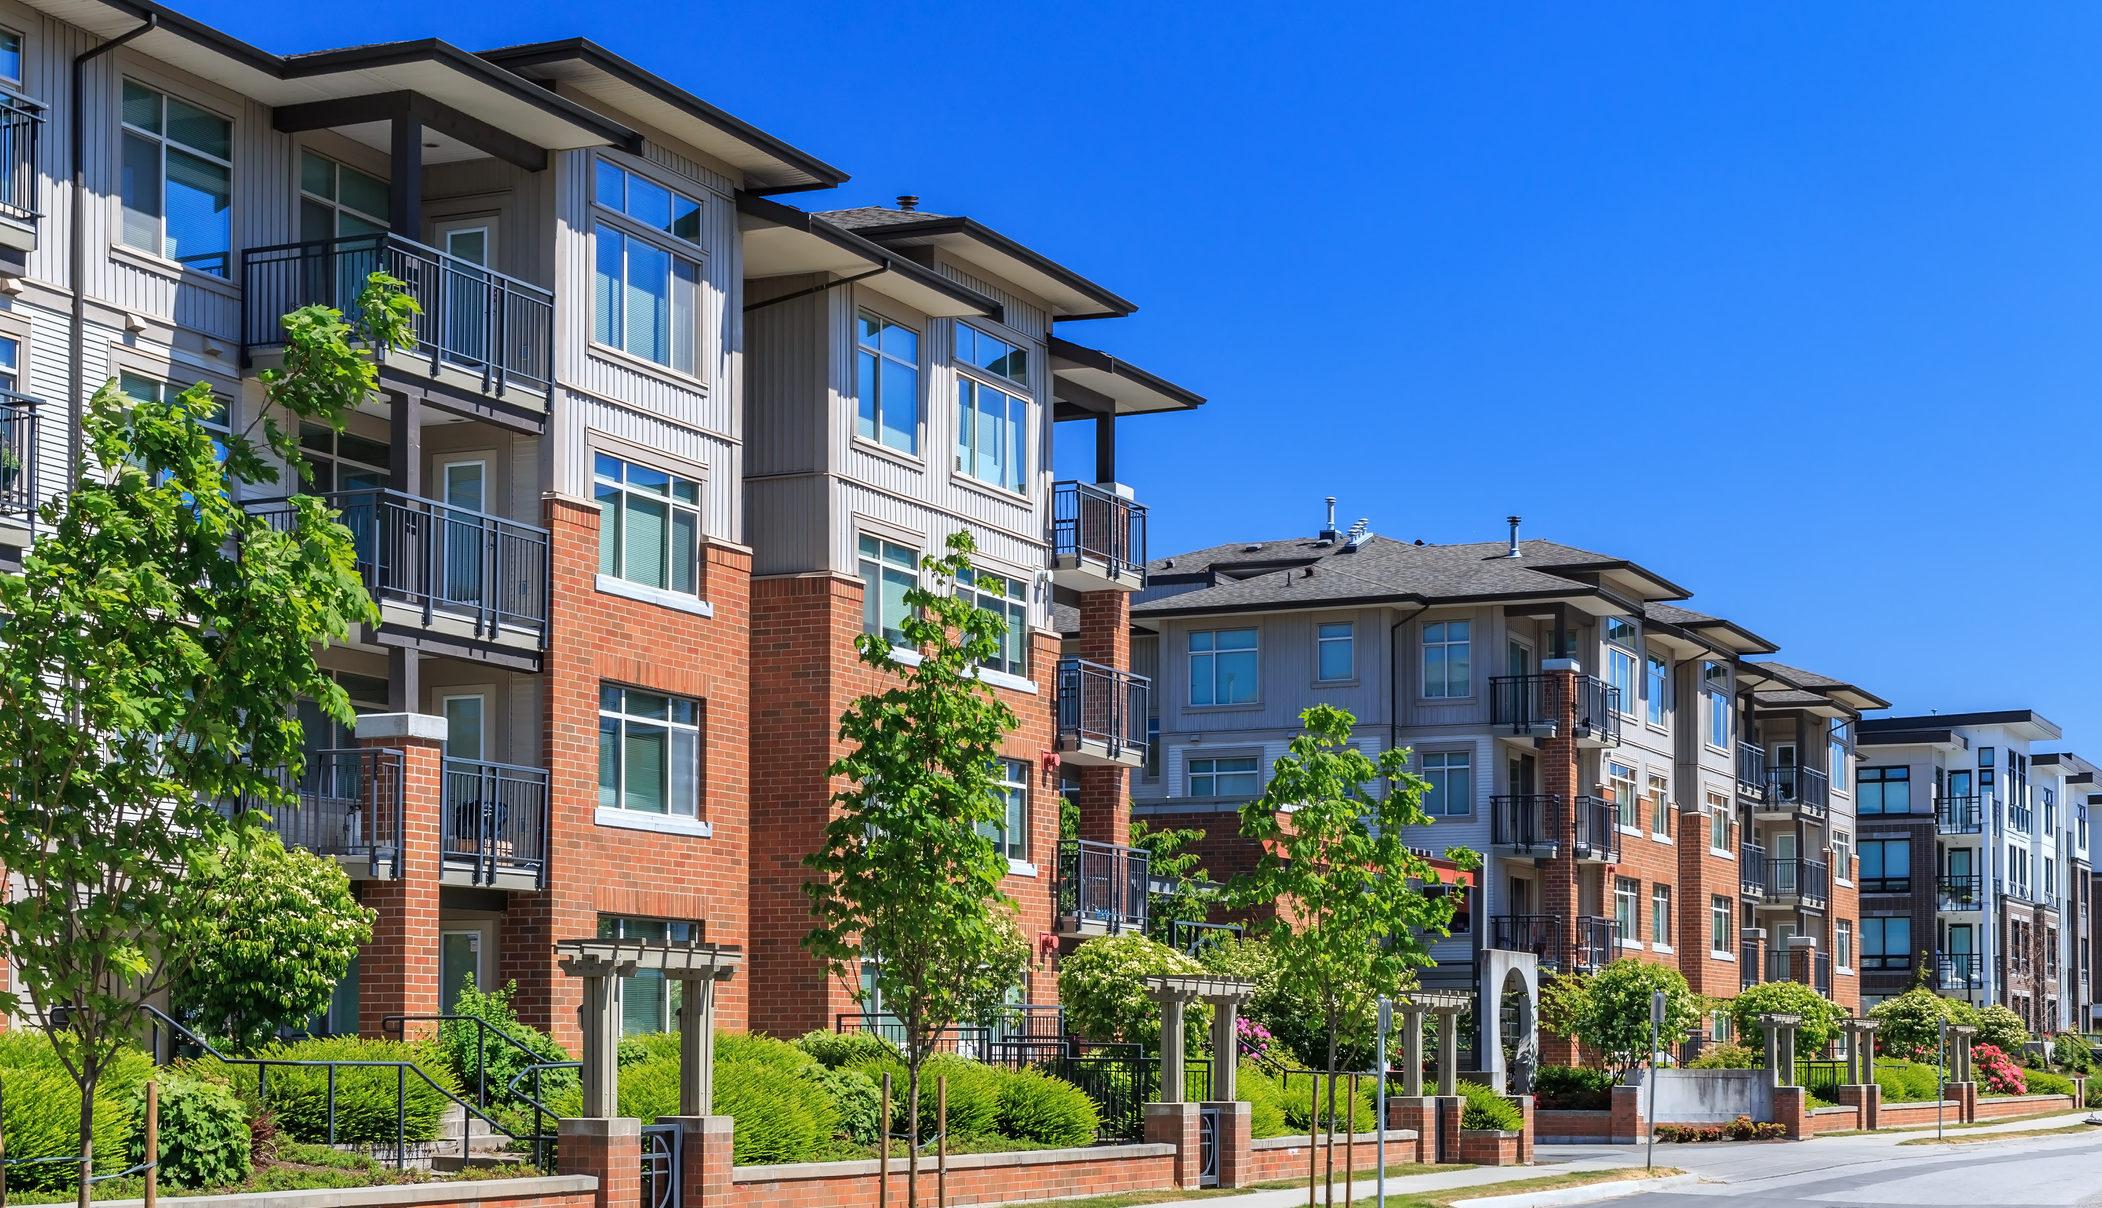 Commercial Real Estate Milton